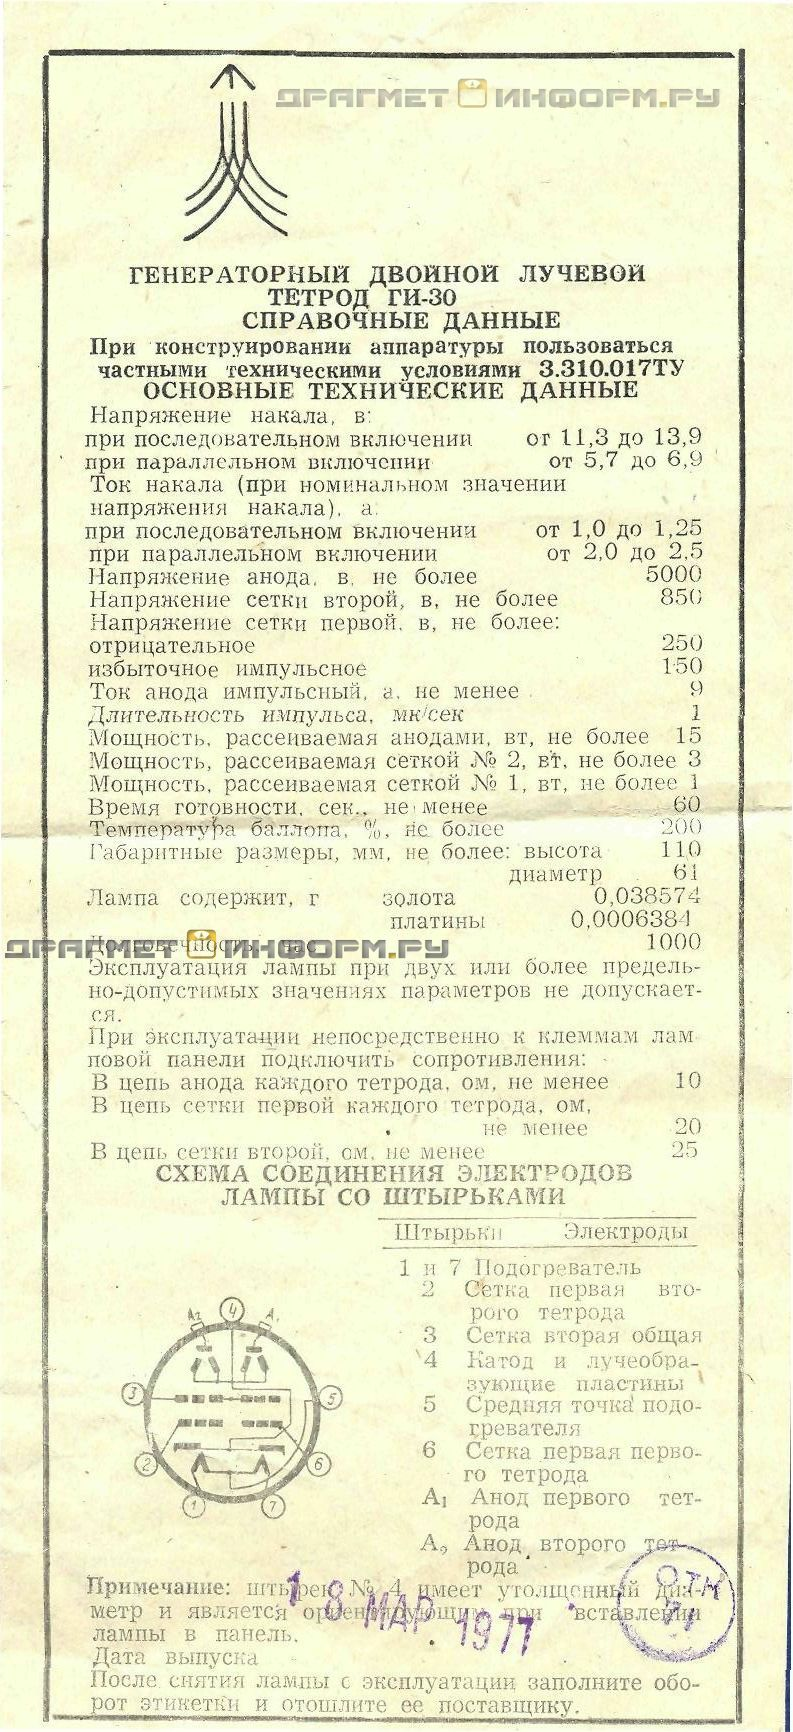 Формуляр ГИ-30